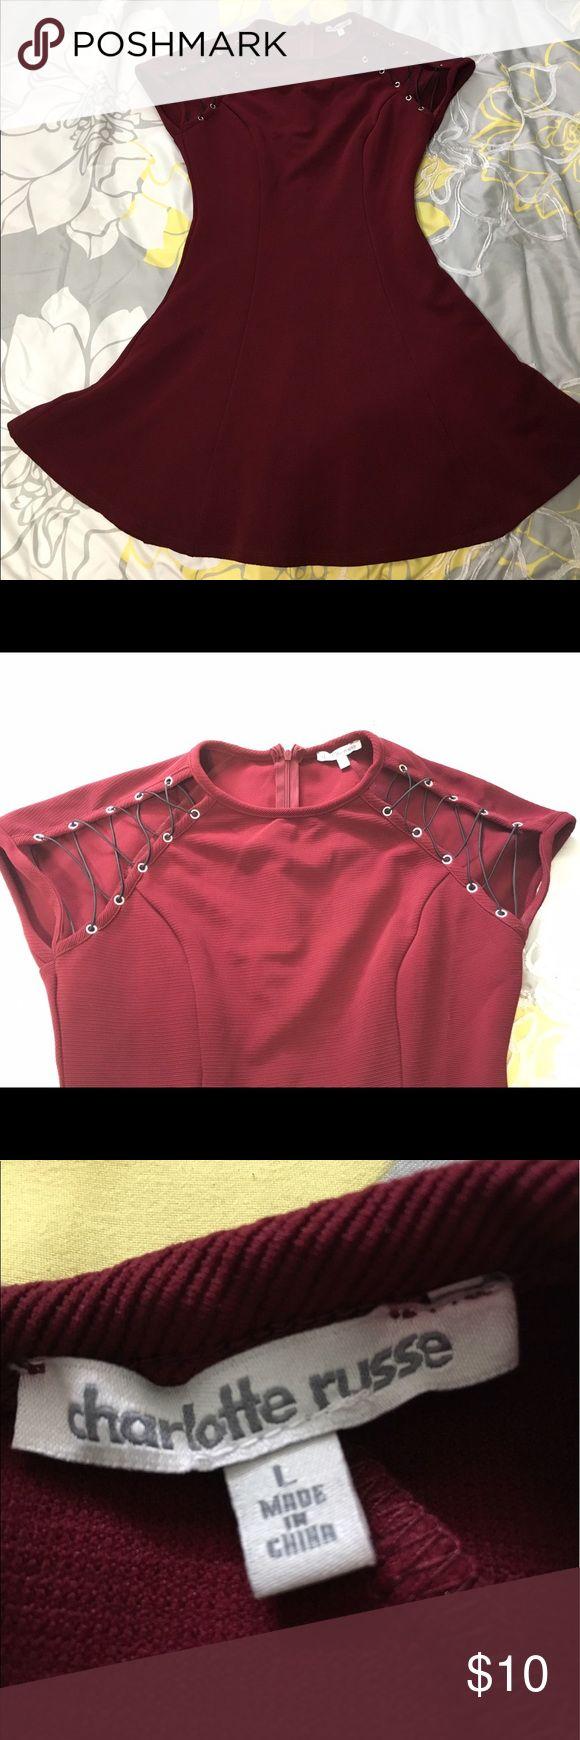 Maroon skater dress Charlotte Russe maroon skater dress with lace up shoulder detail size L euc Charlotte Russe Dresses